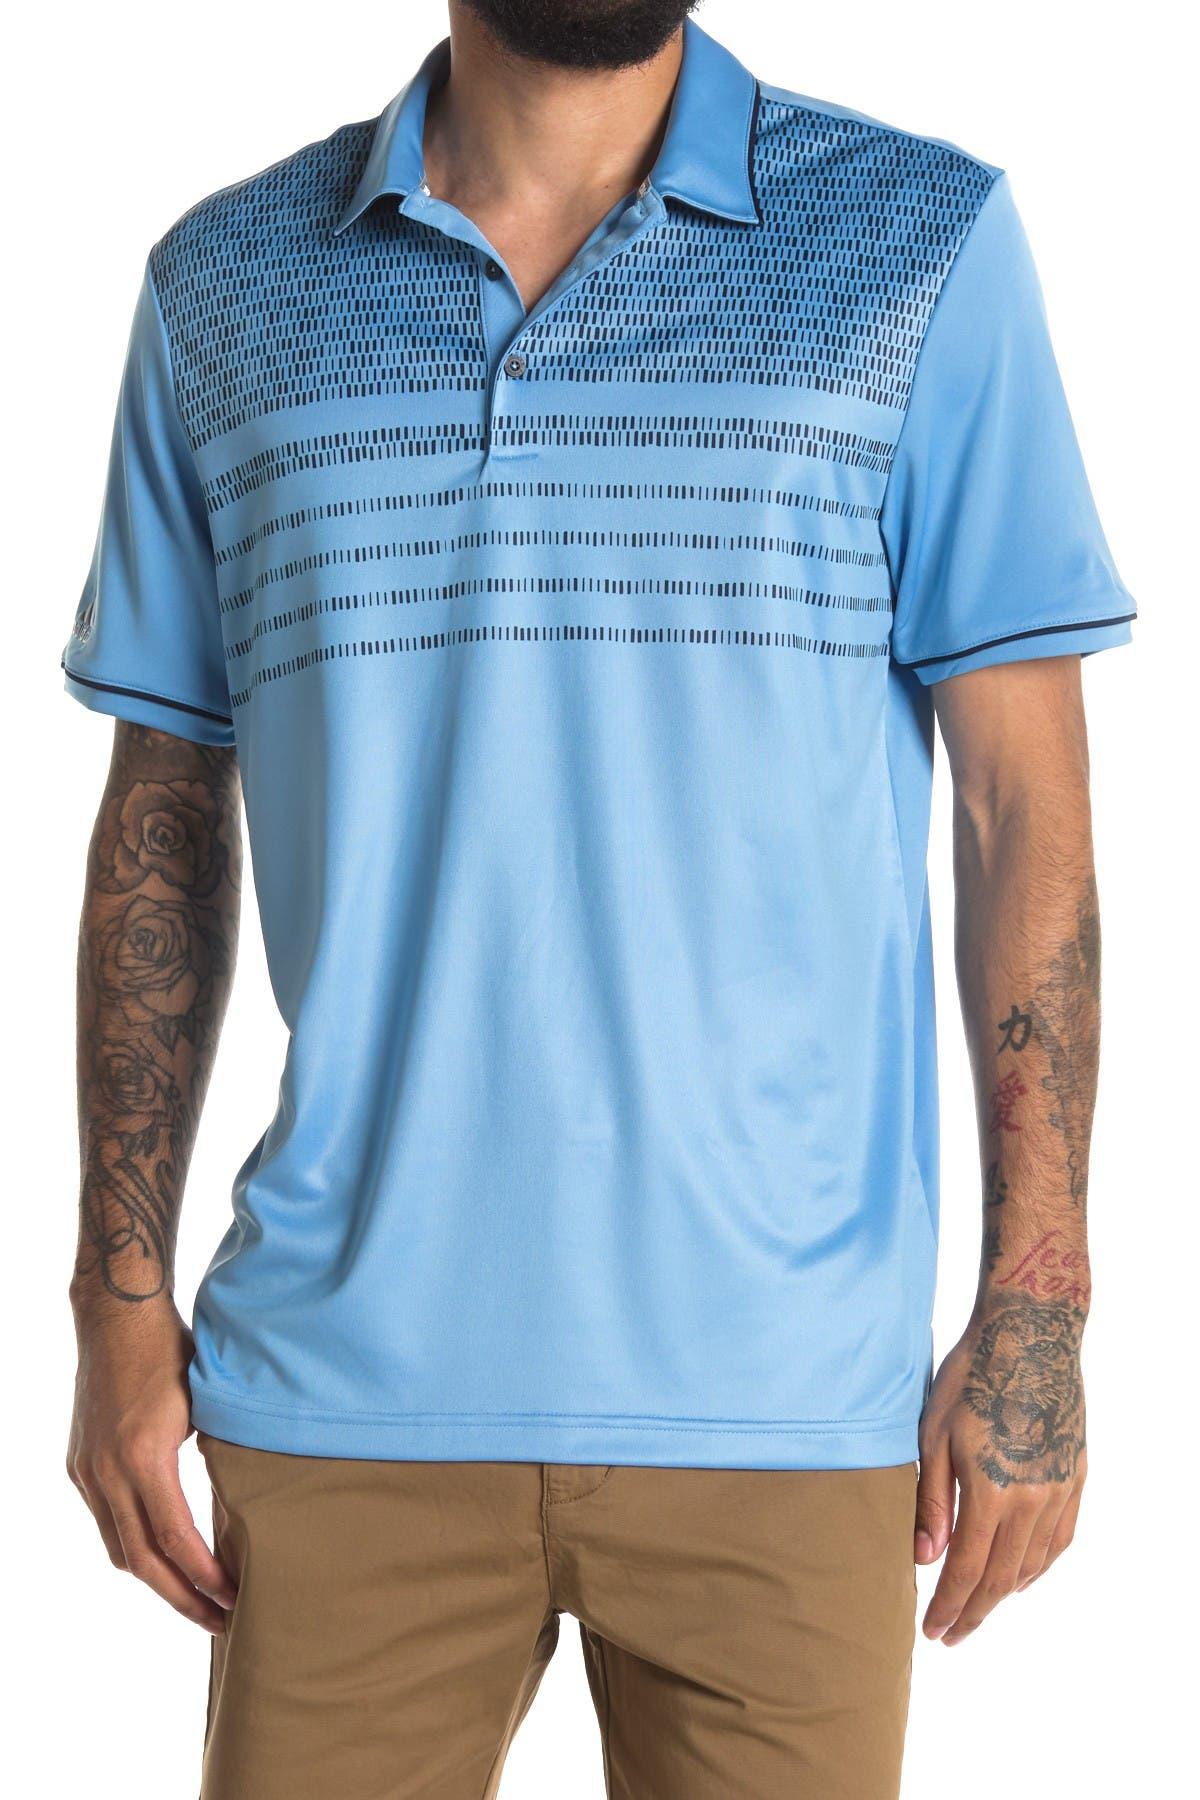 Image of Adidas Golf Core Novelty Golf Polo Shirt